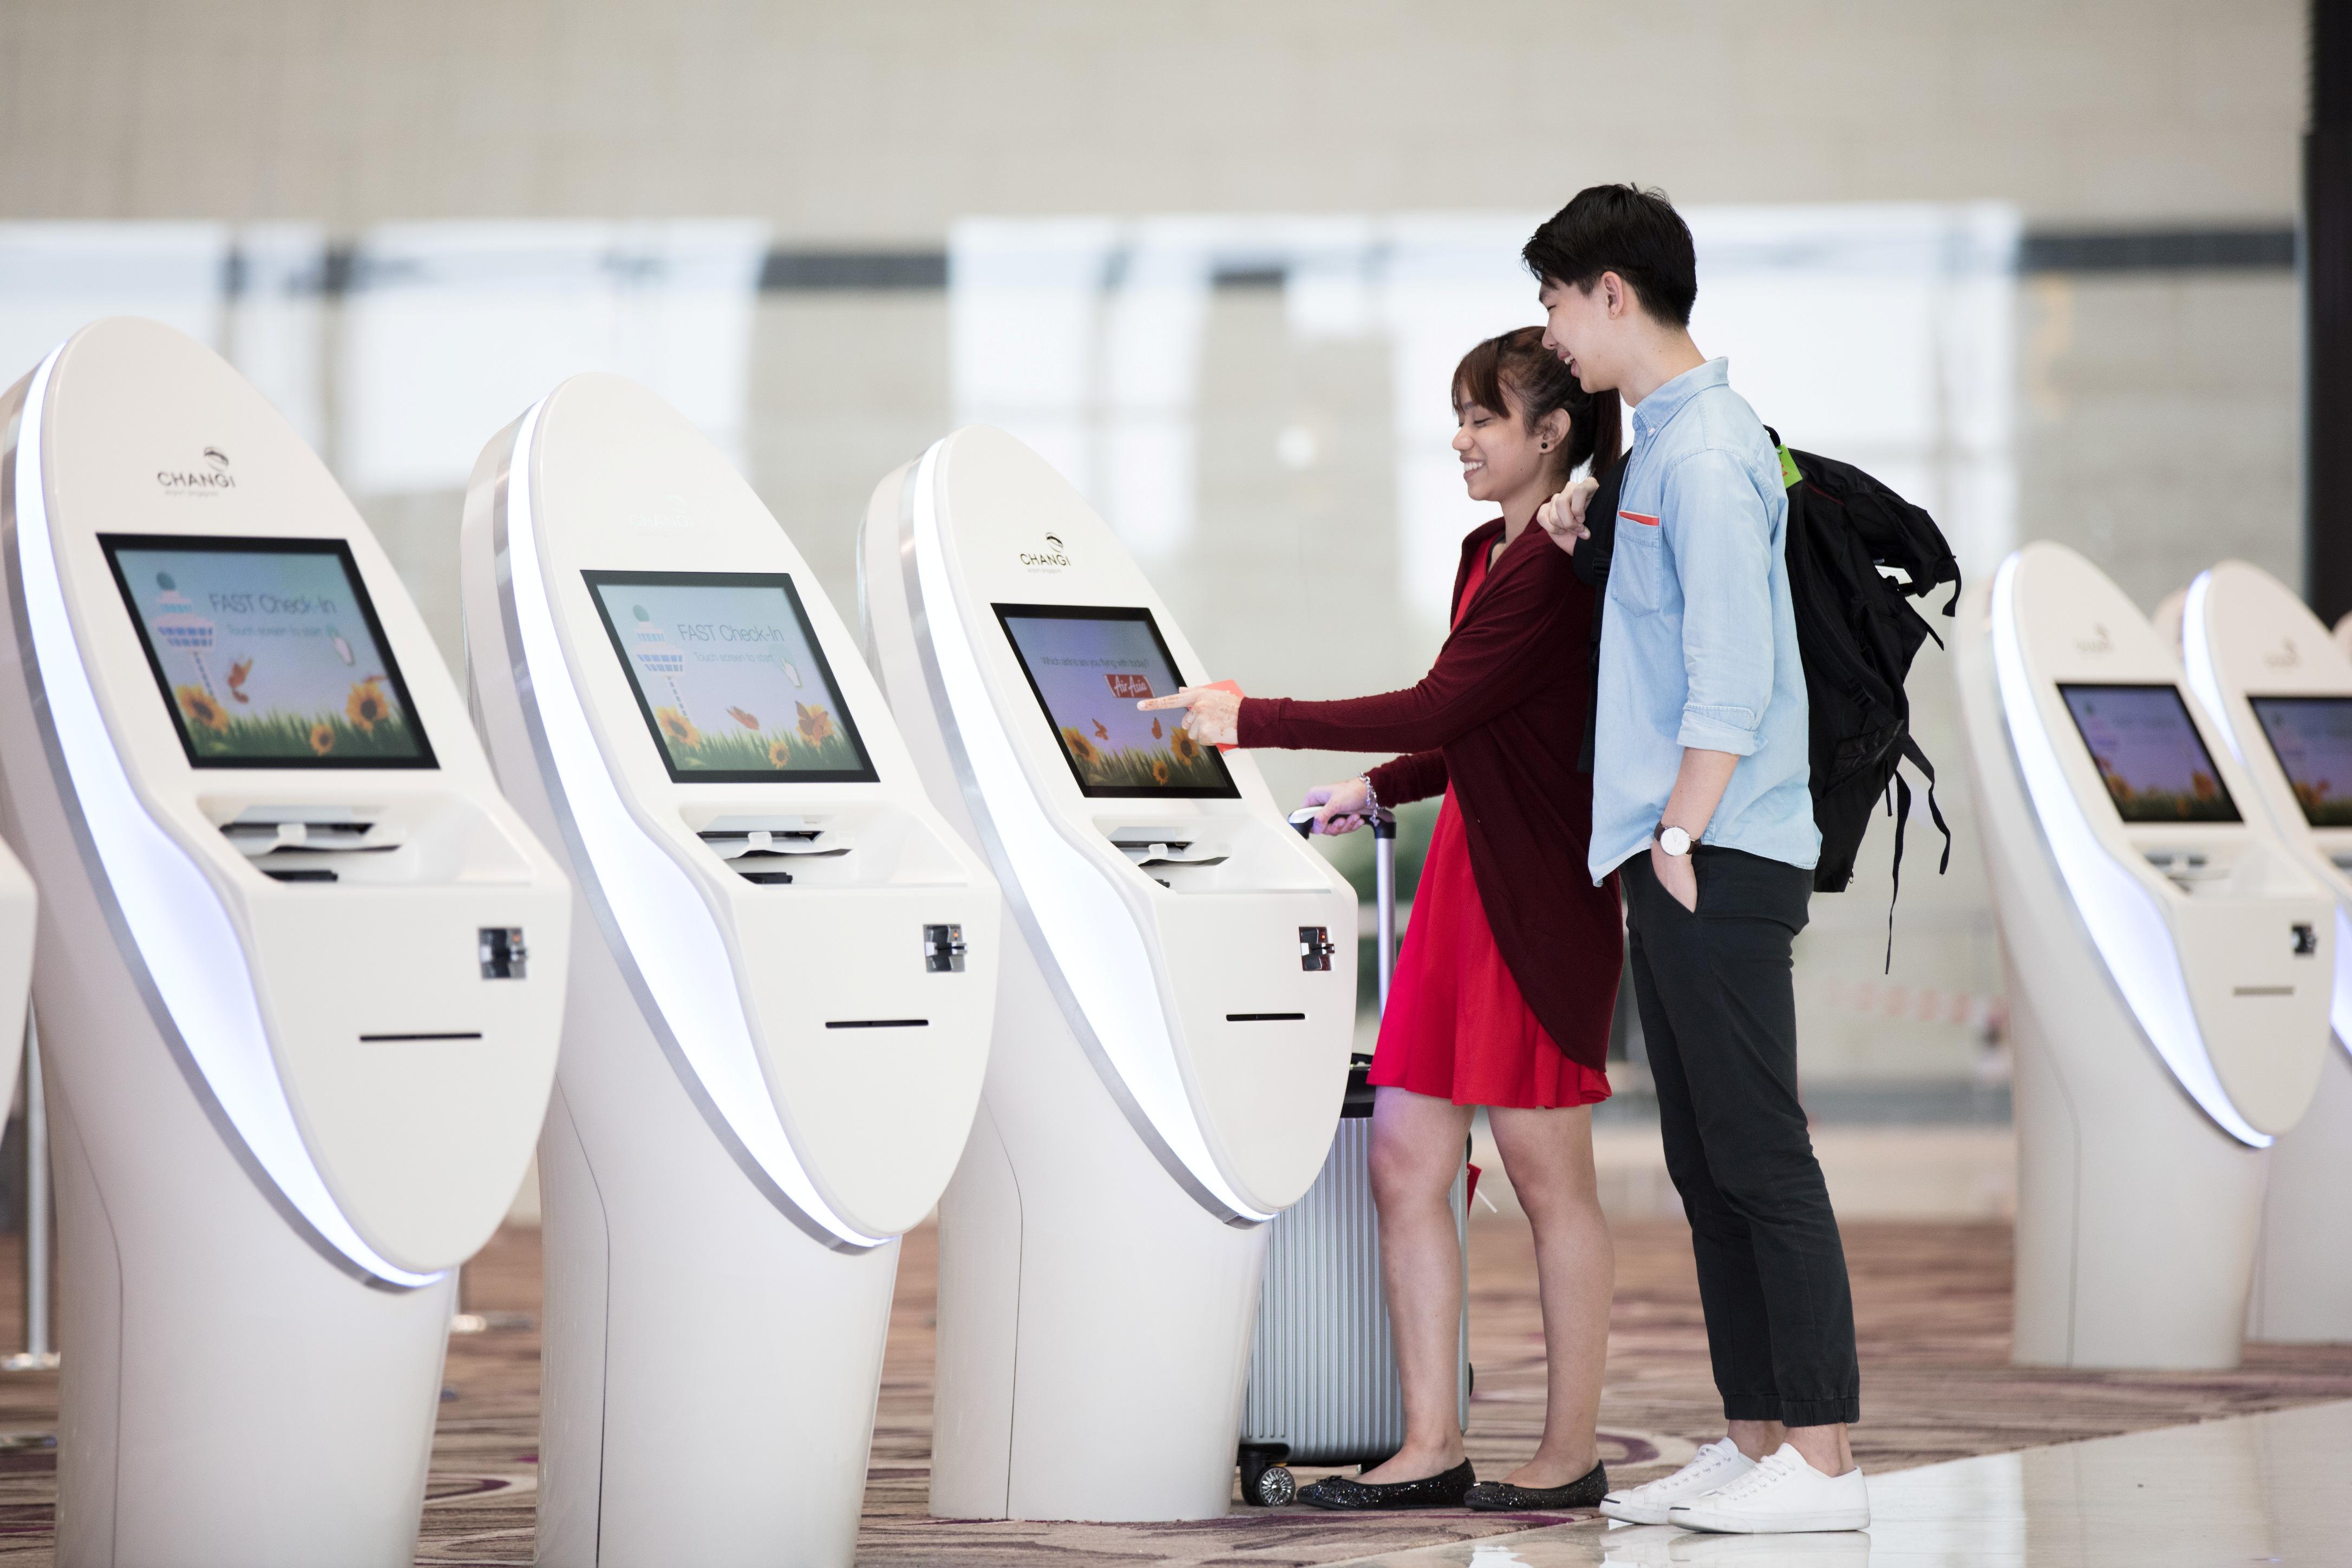 Changi Airport Terminal 4 (T4)